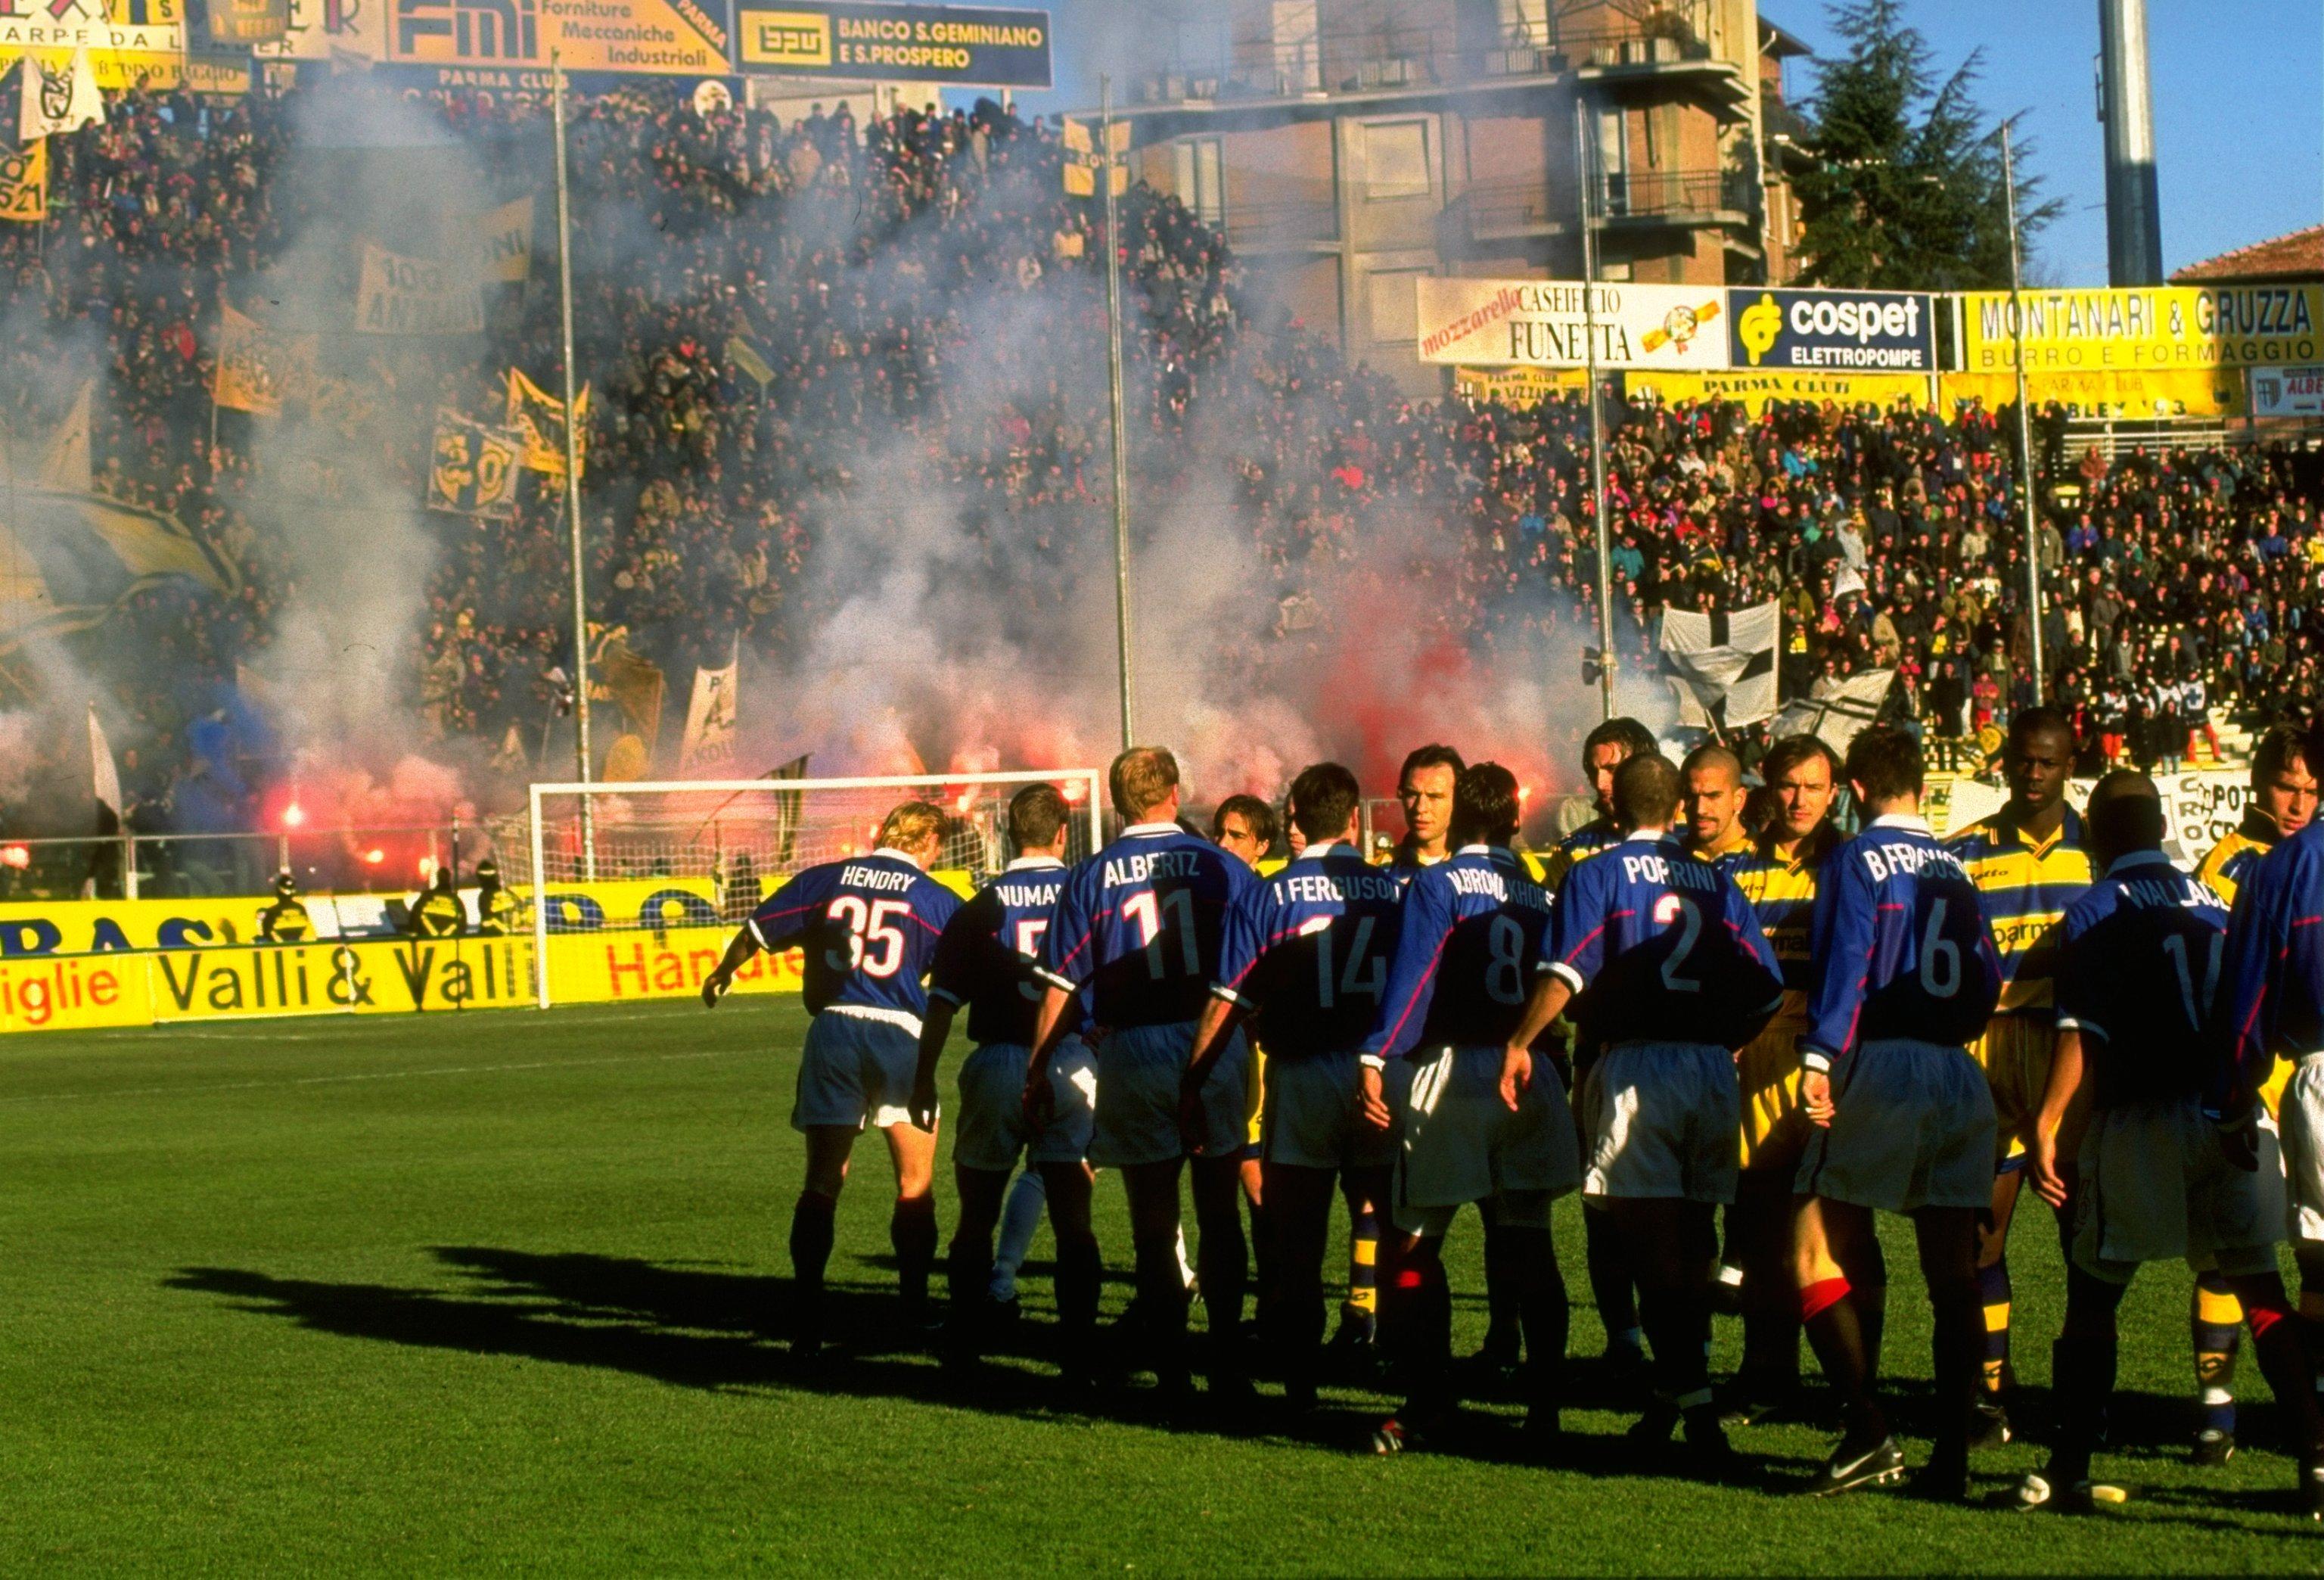 Parma v Rangers The teams shake hands